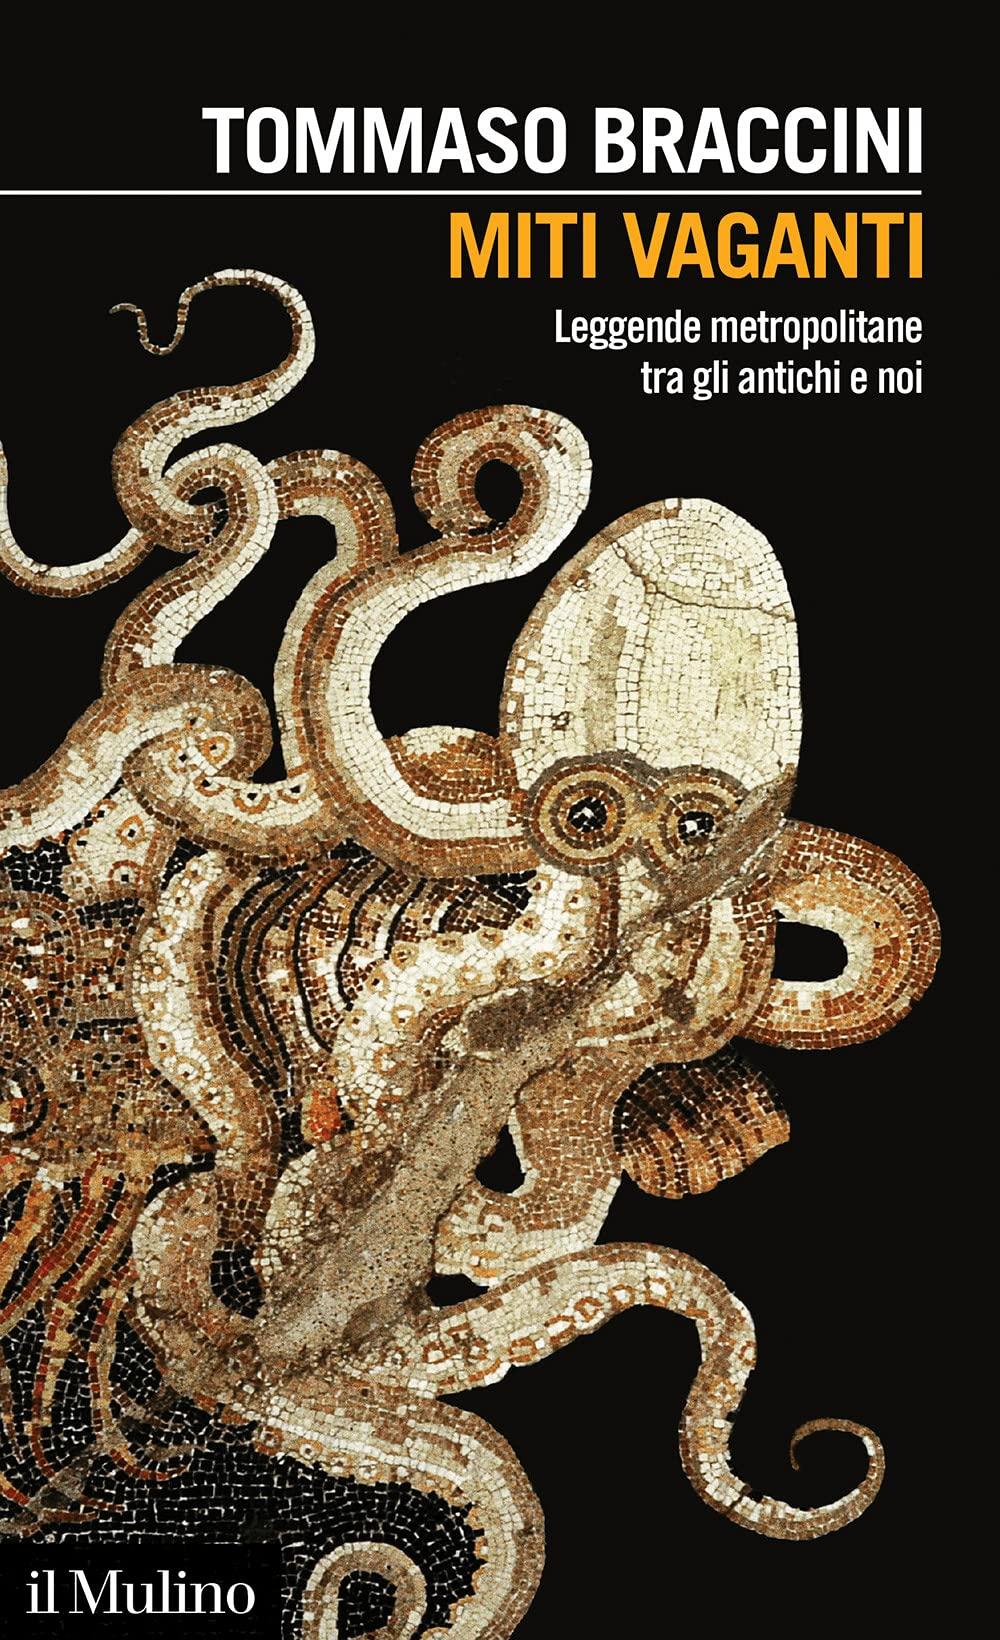 Miti vaganti. Leggende metropolitane tra gli antichi e noi : Braccini, Tommaso: Amazon.it: Libri